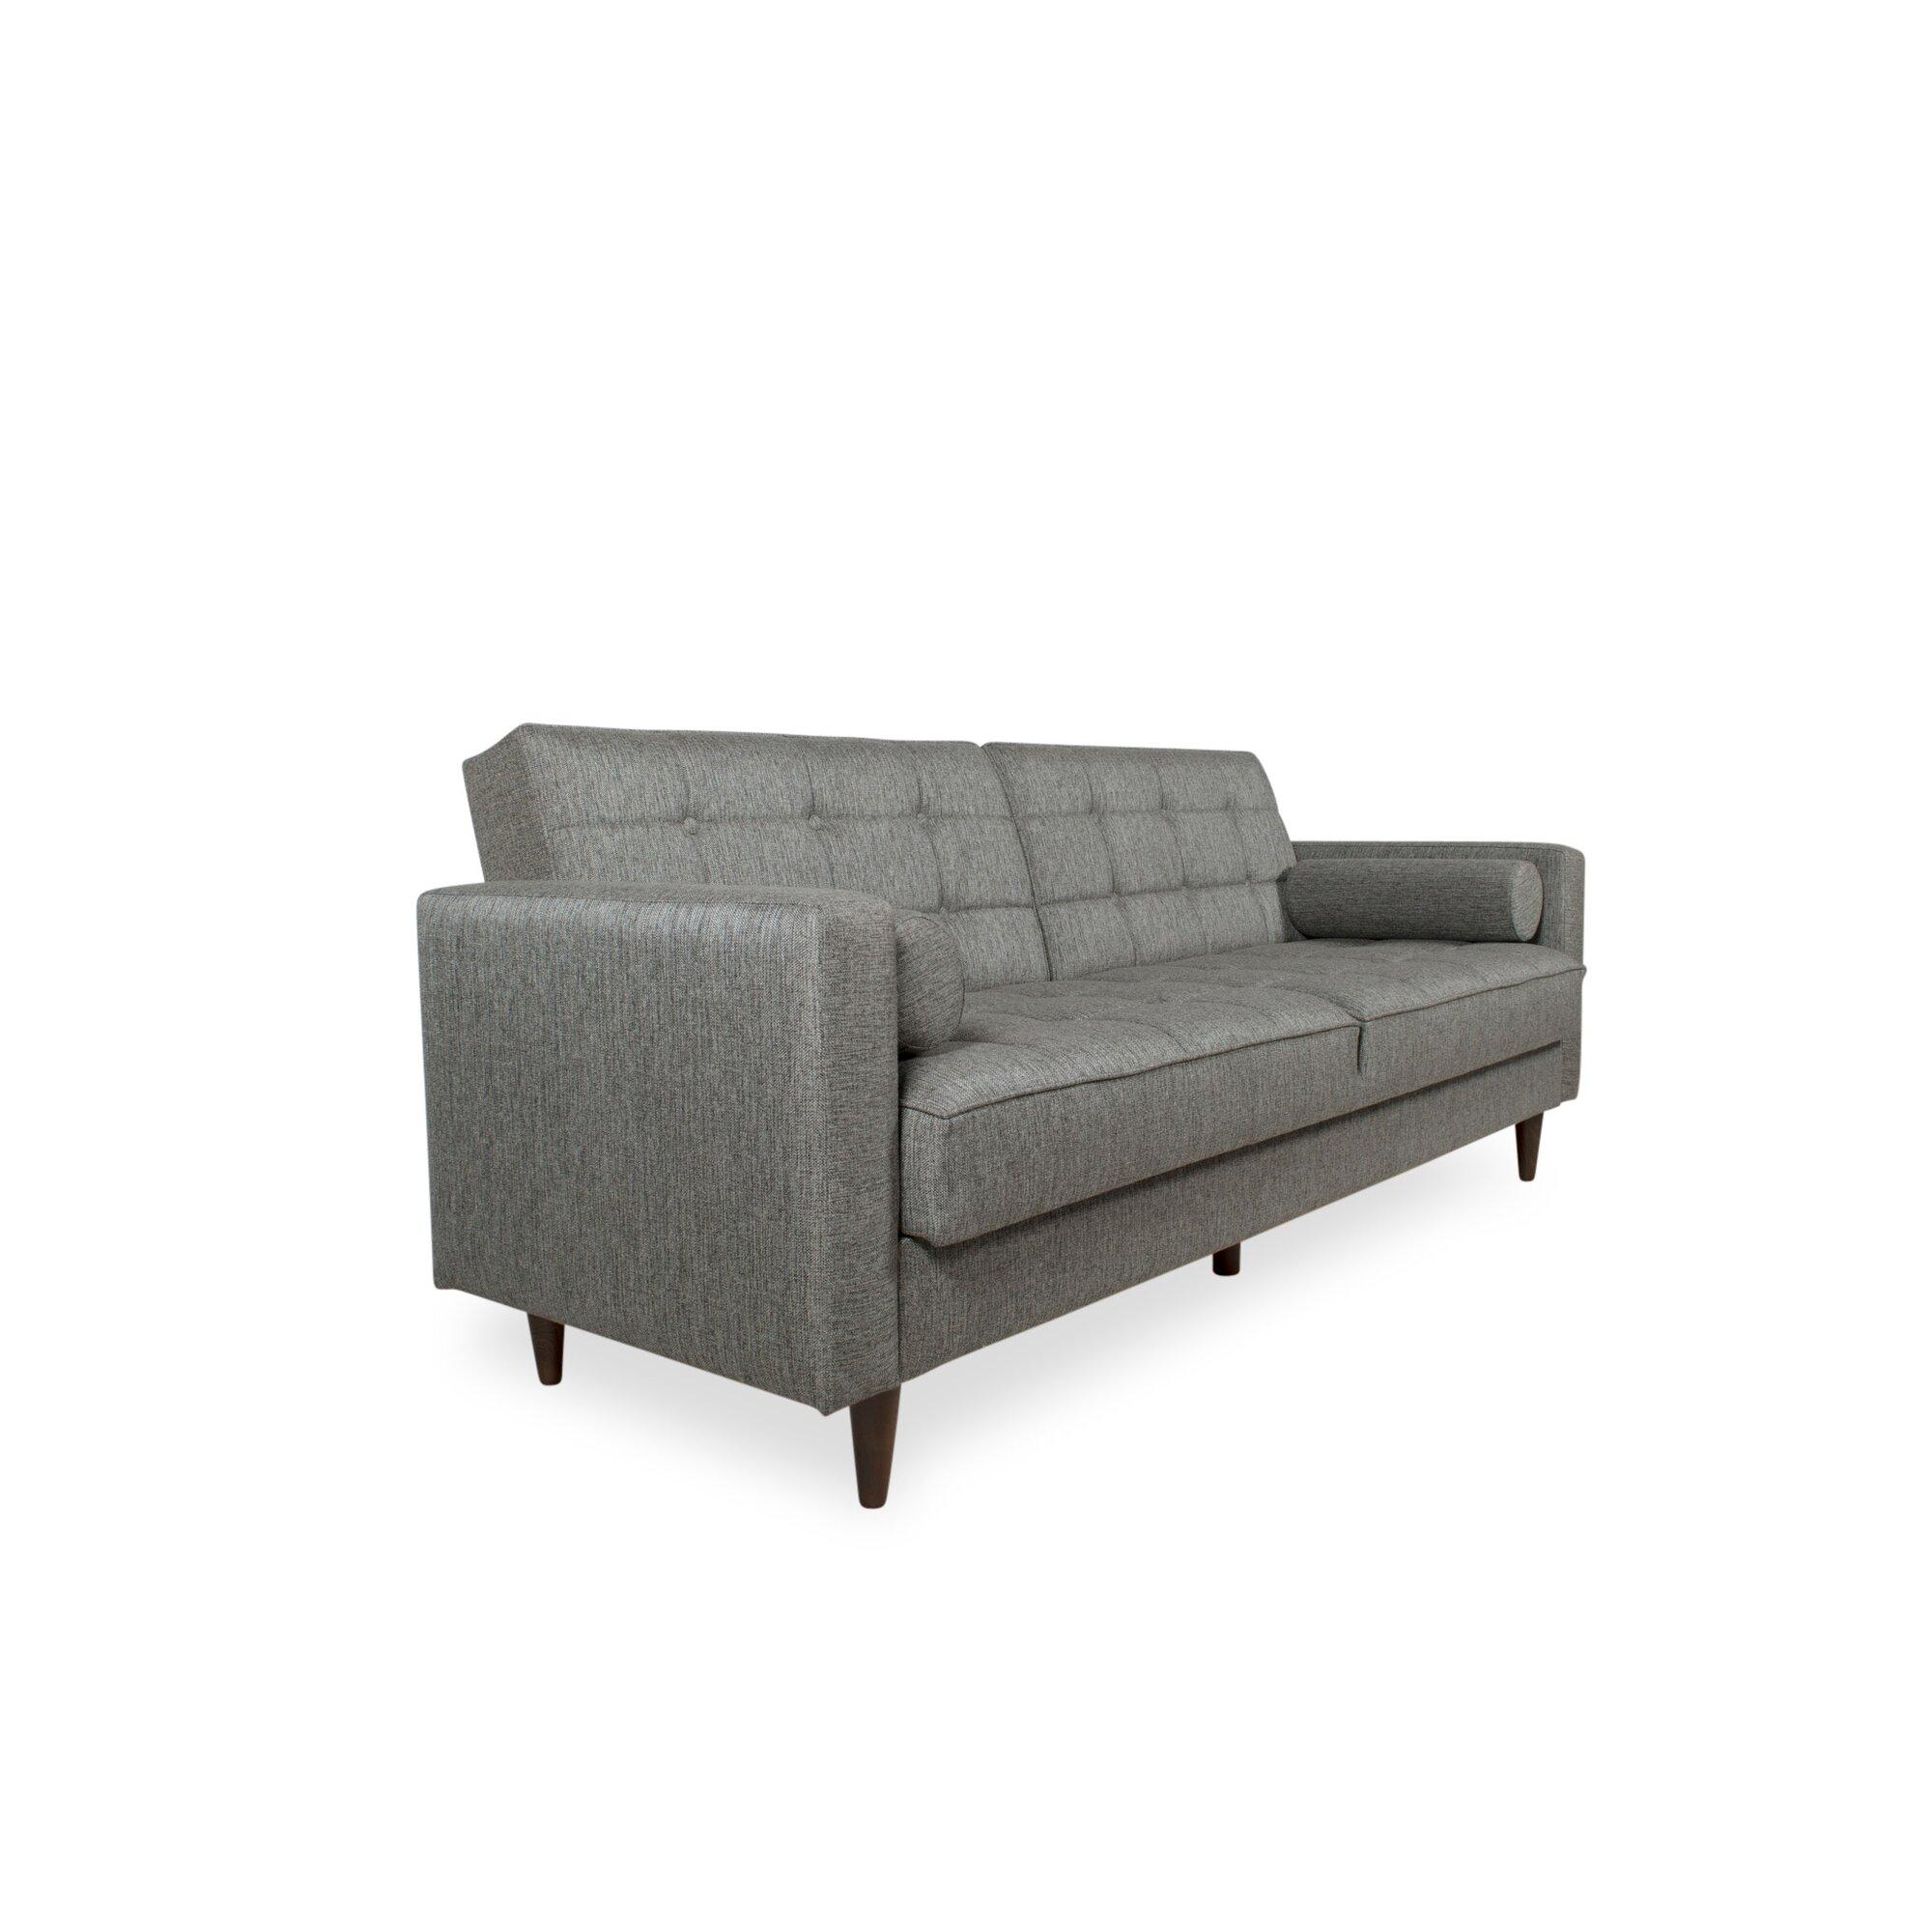 Cheap sofas seattle wa refil sofa for Sofa sectionnel liquidation